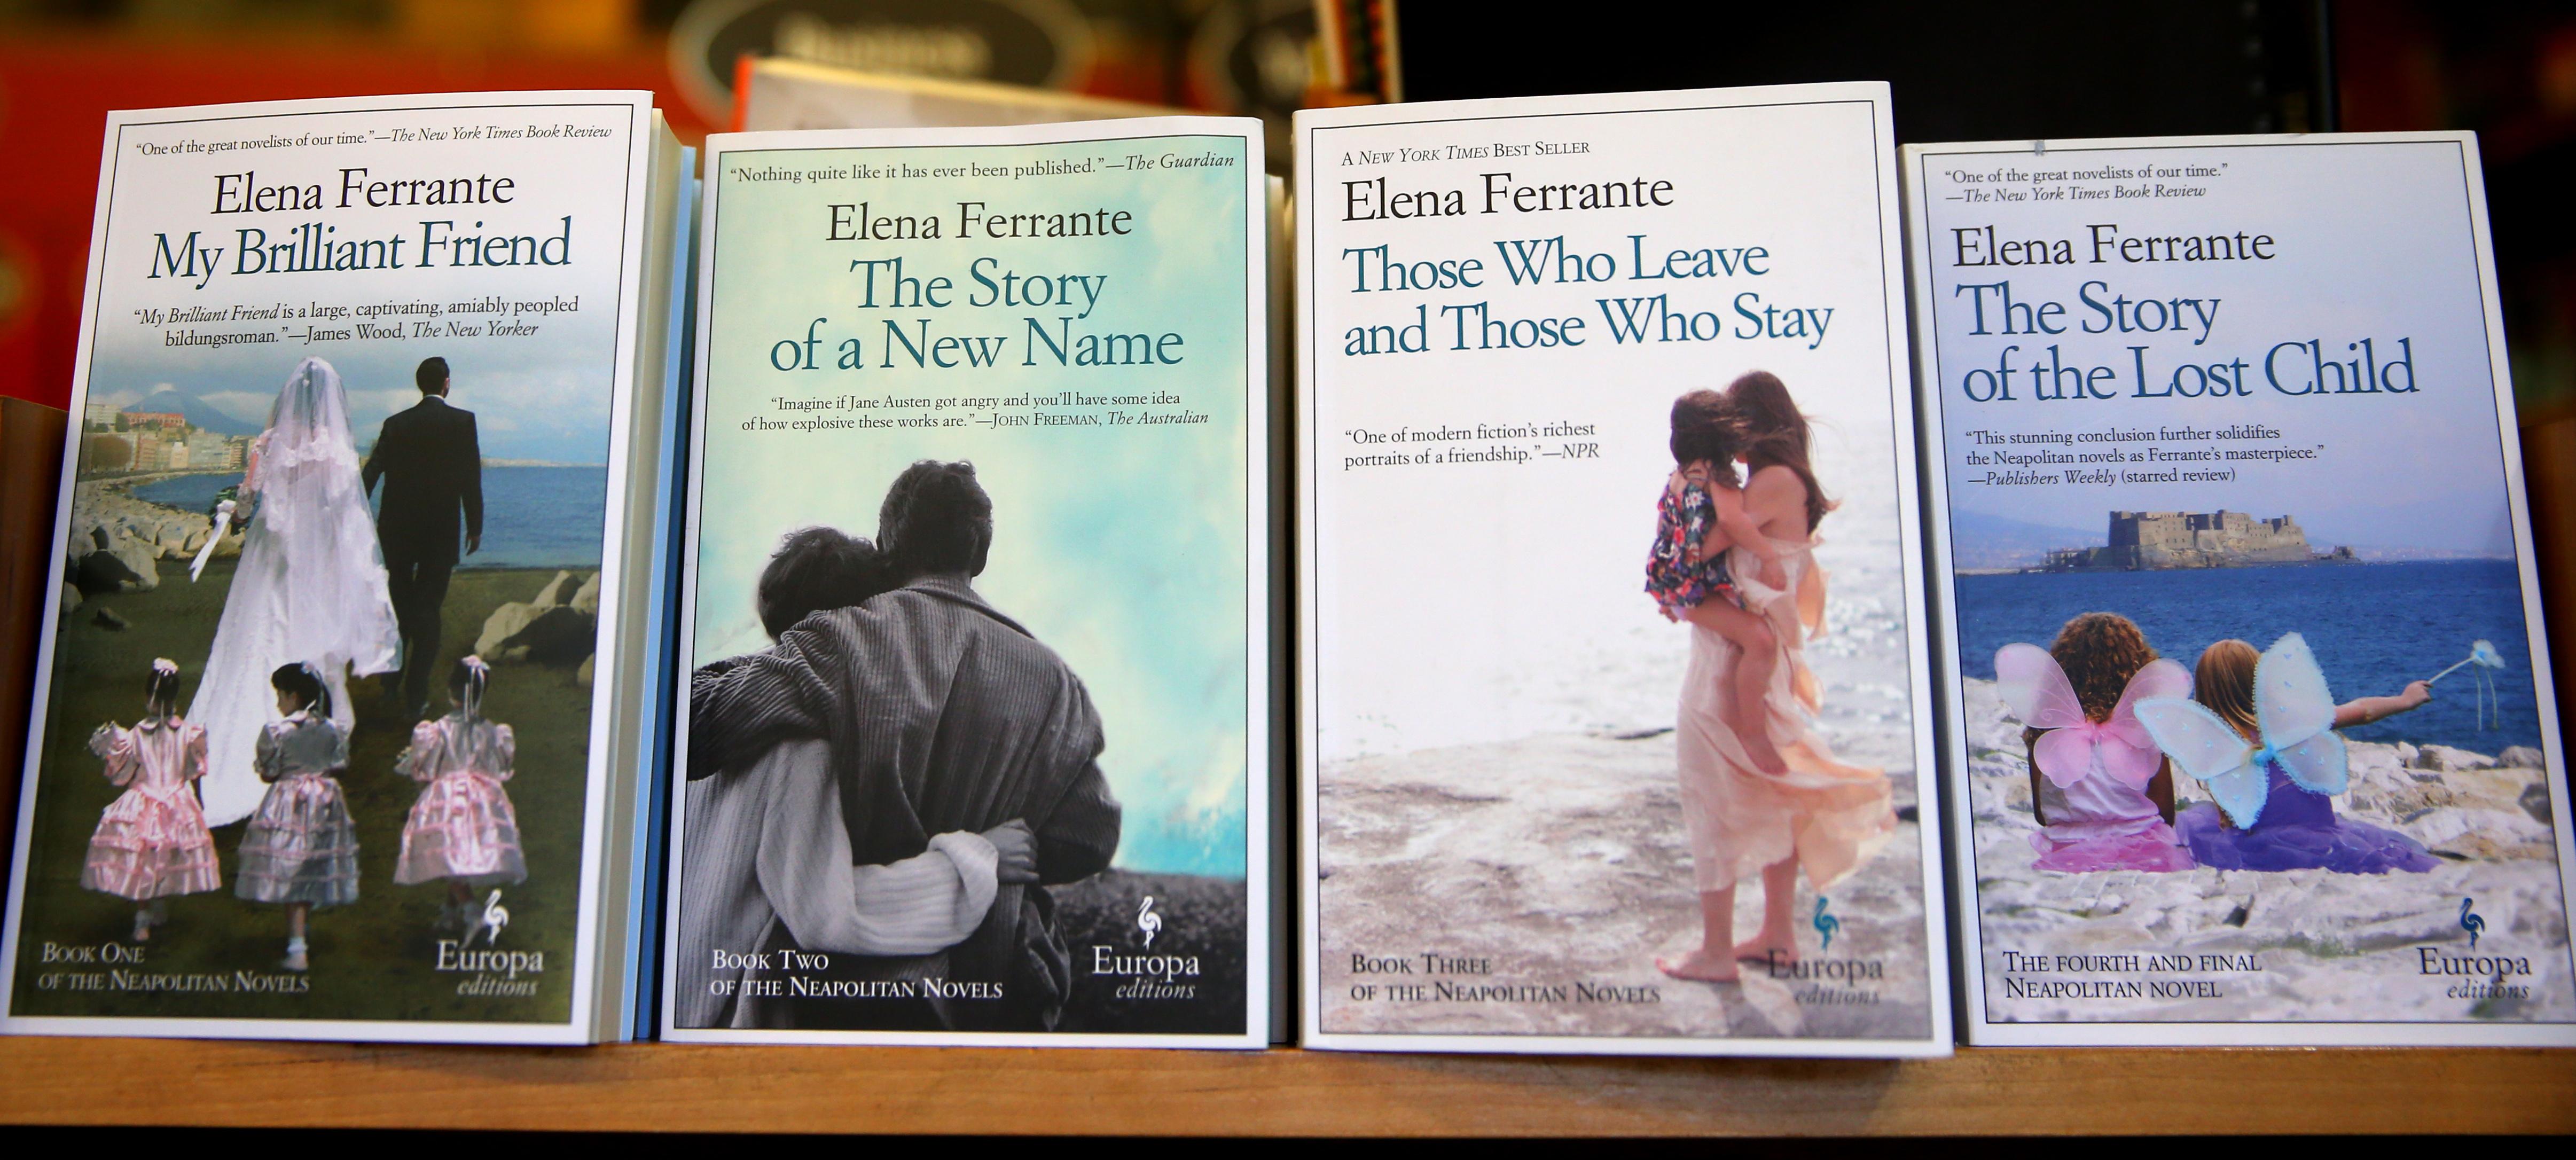 Blue apron npr - For Literary World Unmasking Elena Ferrante S Not A Scoop It S A Disgrace